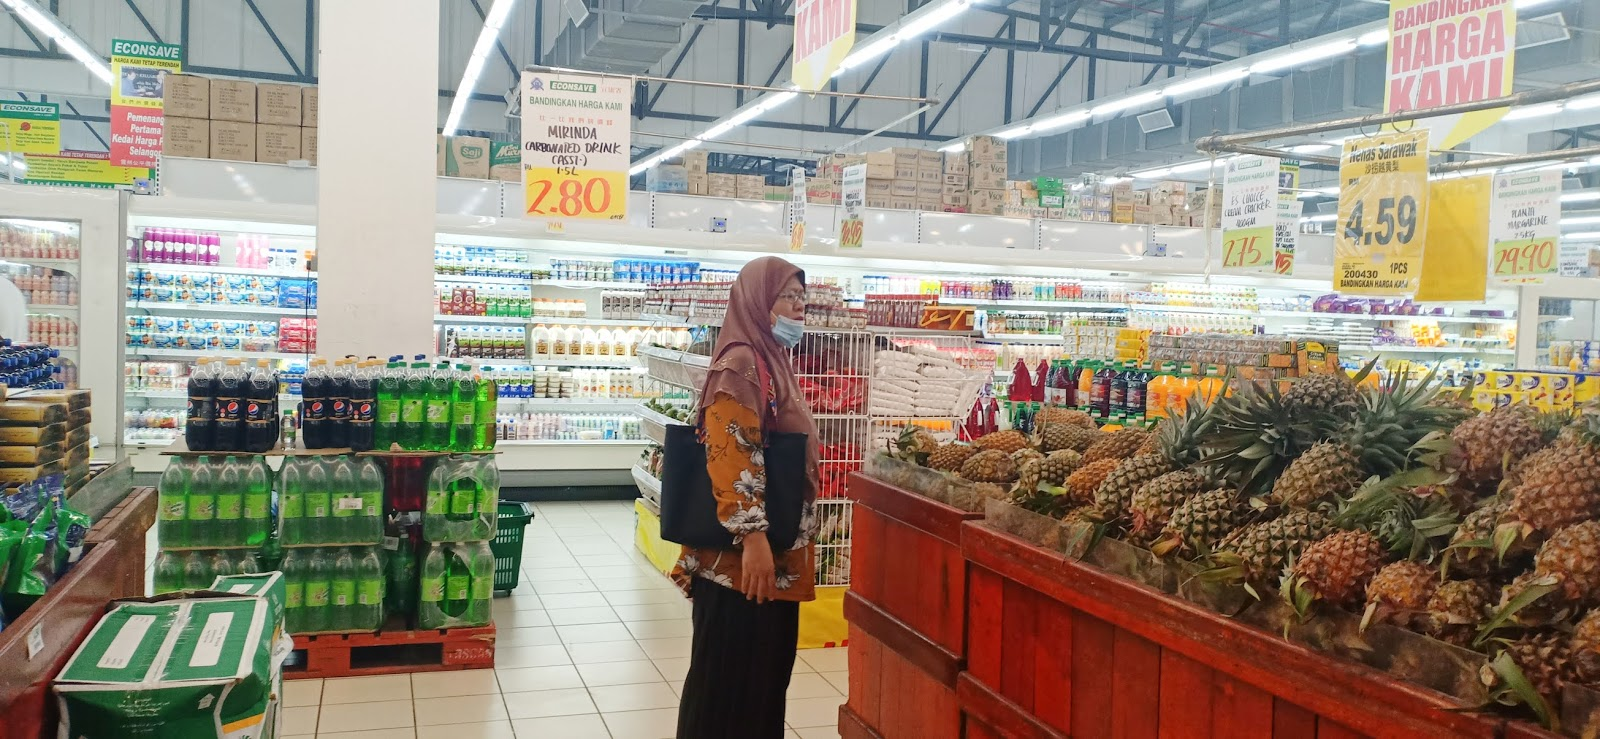 Shopping barang dapur di Econsave Semenyih